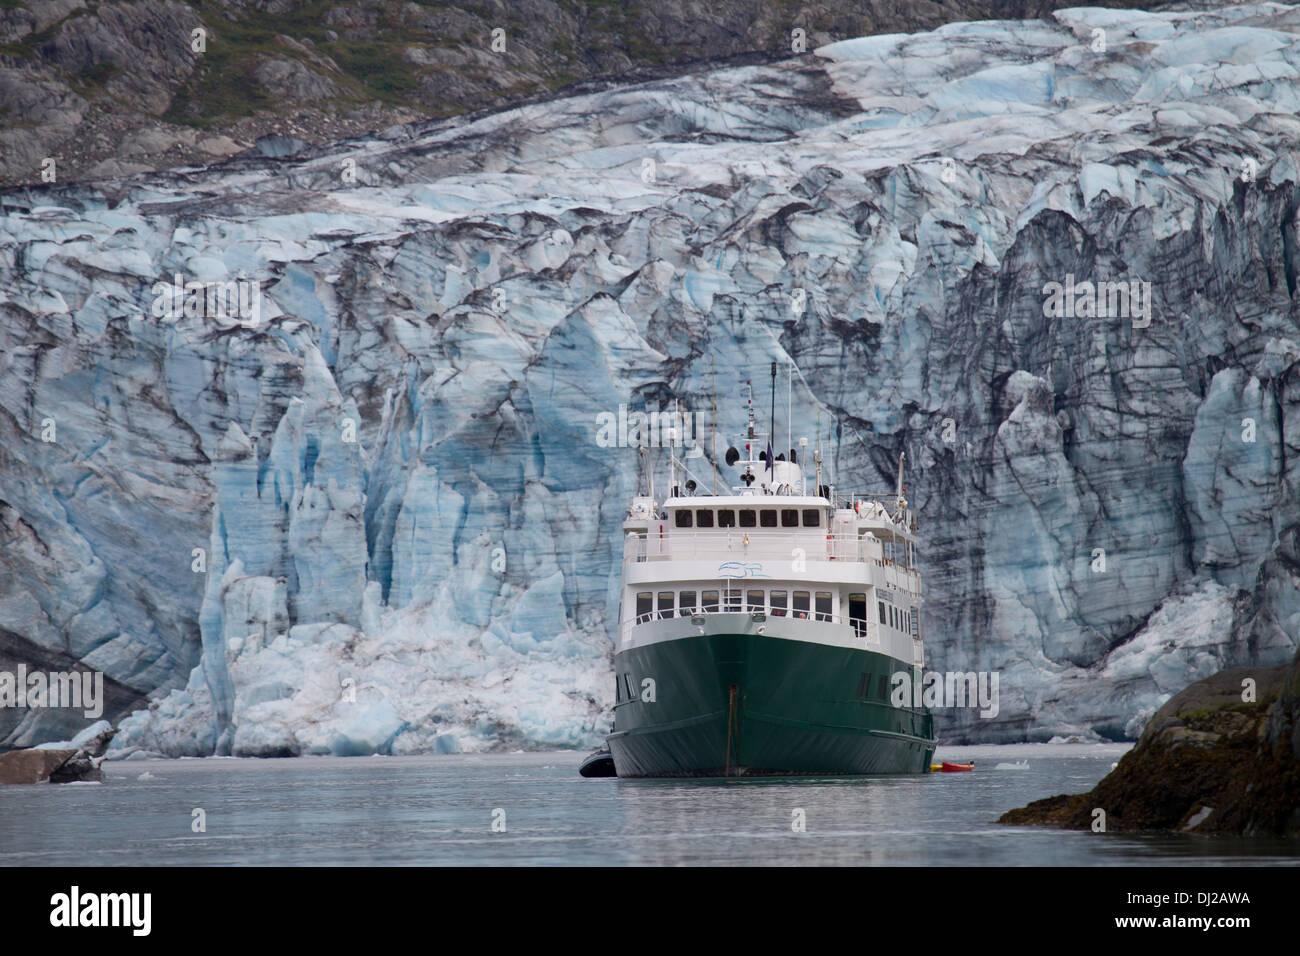 Wilderness Explorer in front of the Margerie Glacier, Glacier bay , Alaska - Stock Image